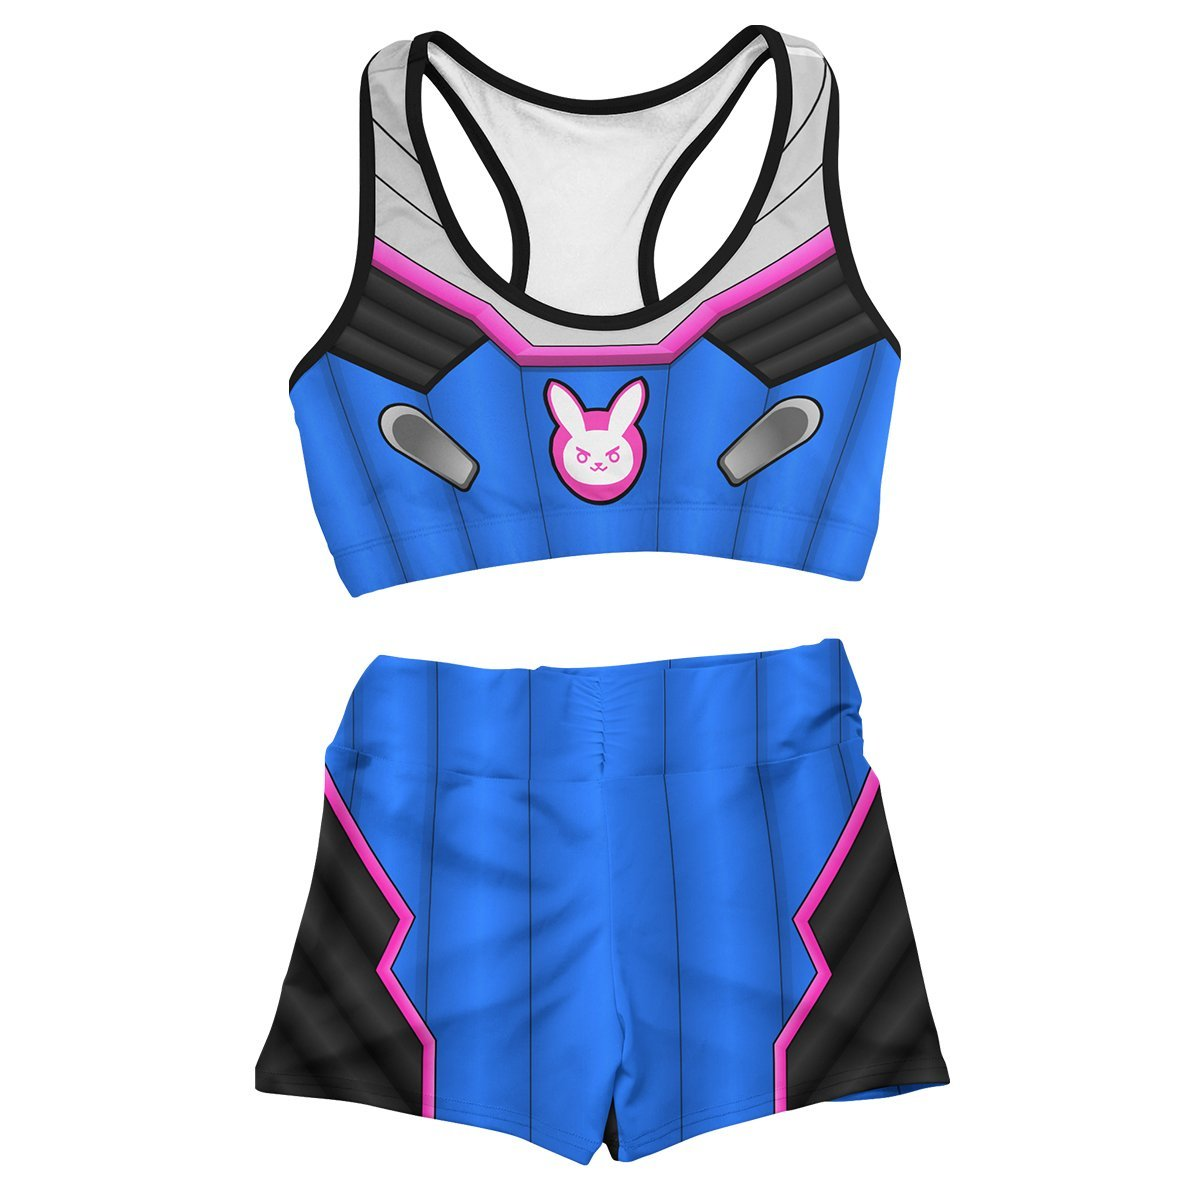 Dva Summer Active Wear Set FDM3107 Entire Set Official Anime Swimsuit Merch